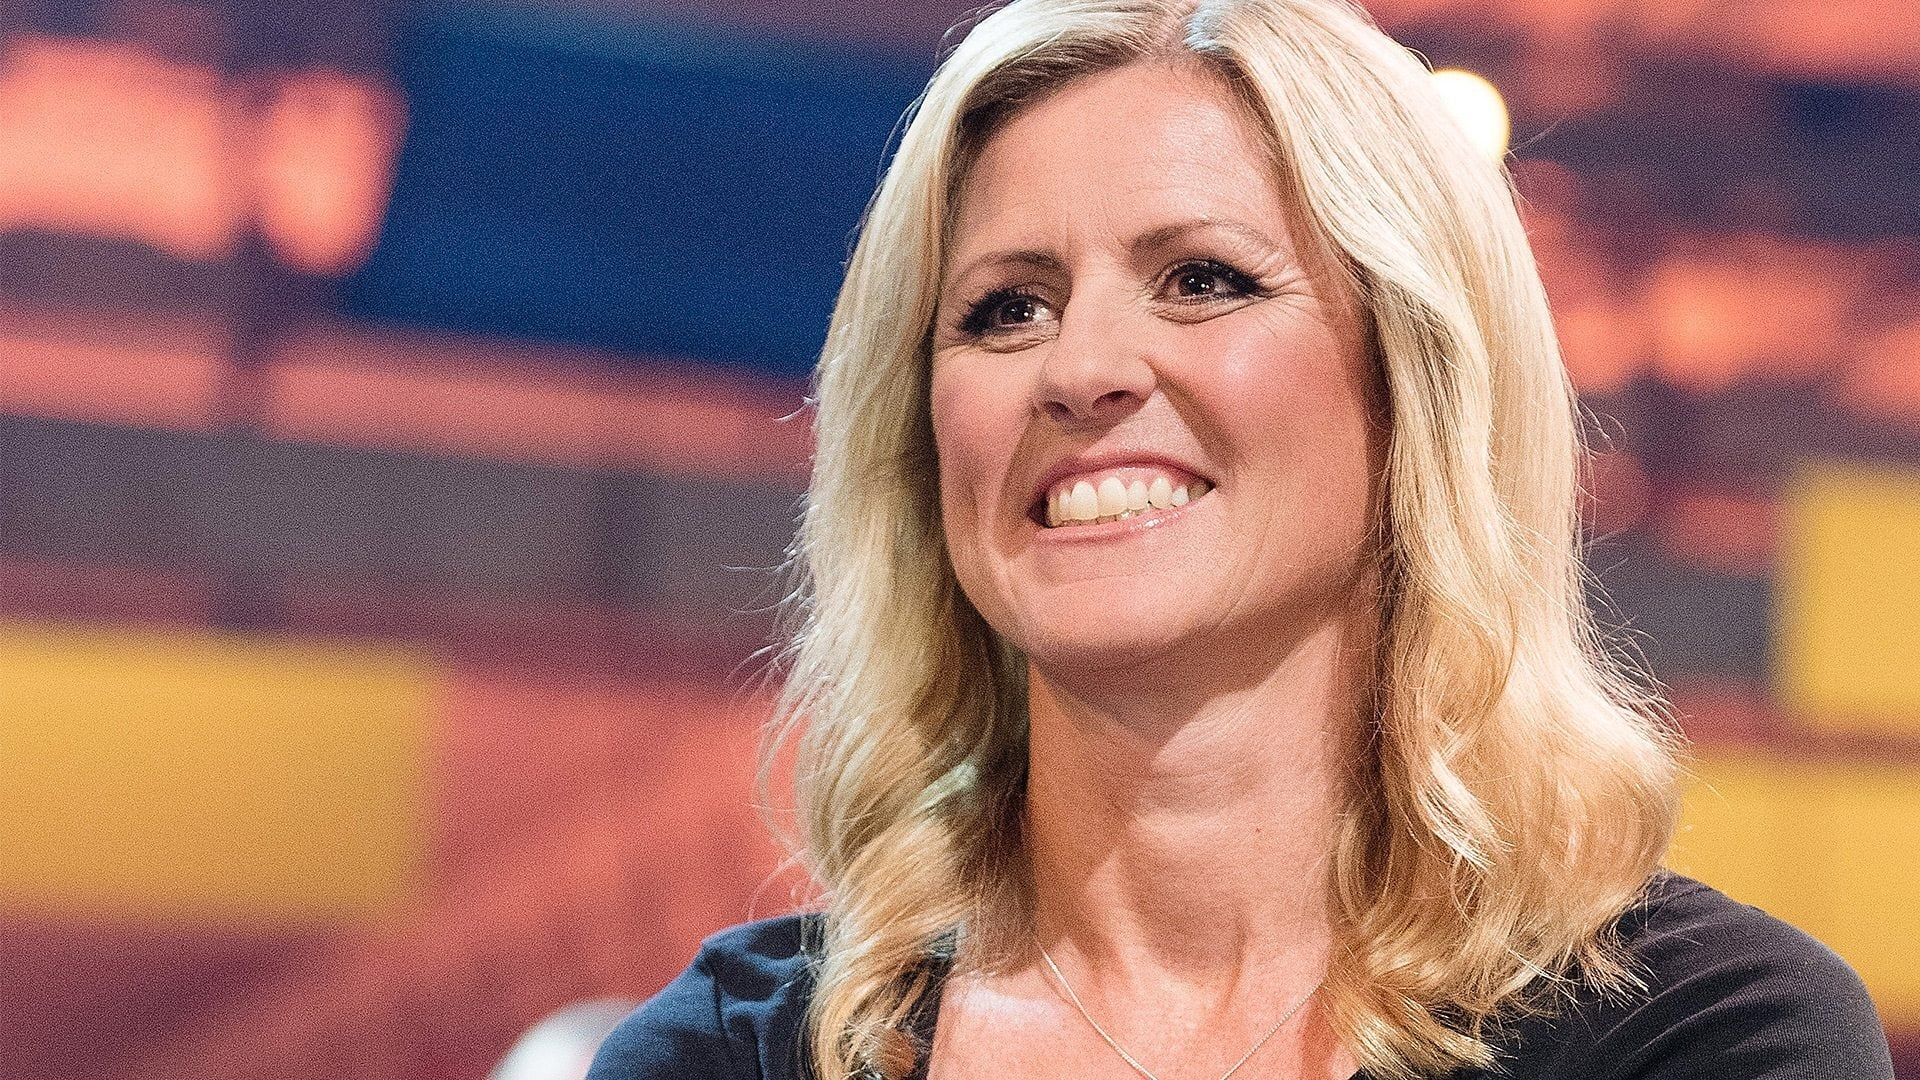 Top Gear - Season 0 Episode 83 : A tribute to Sabine Schmitz